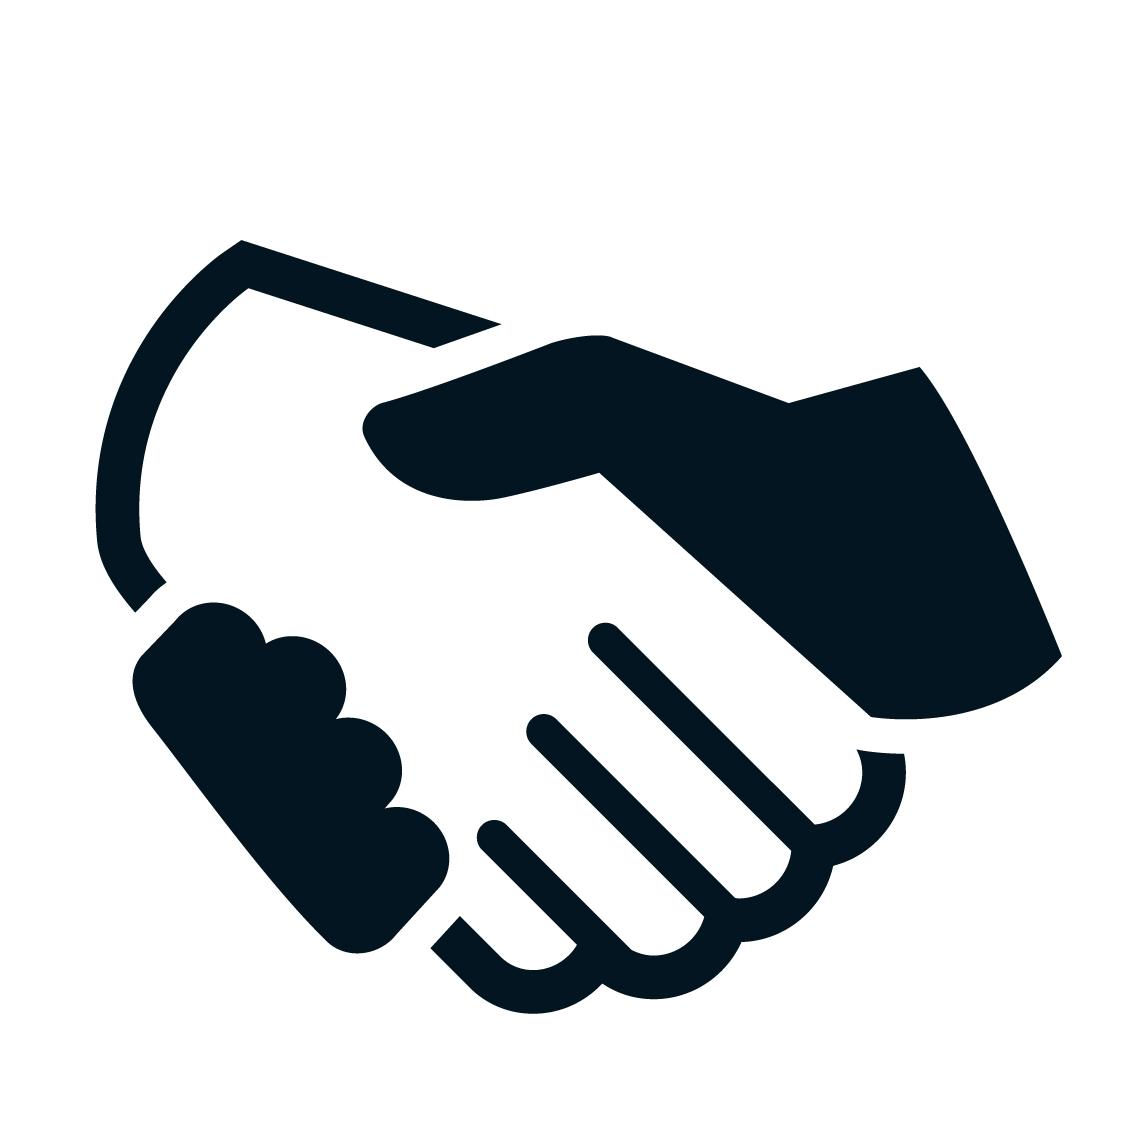 1145x1143 Vector Handshake Free